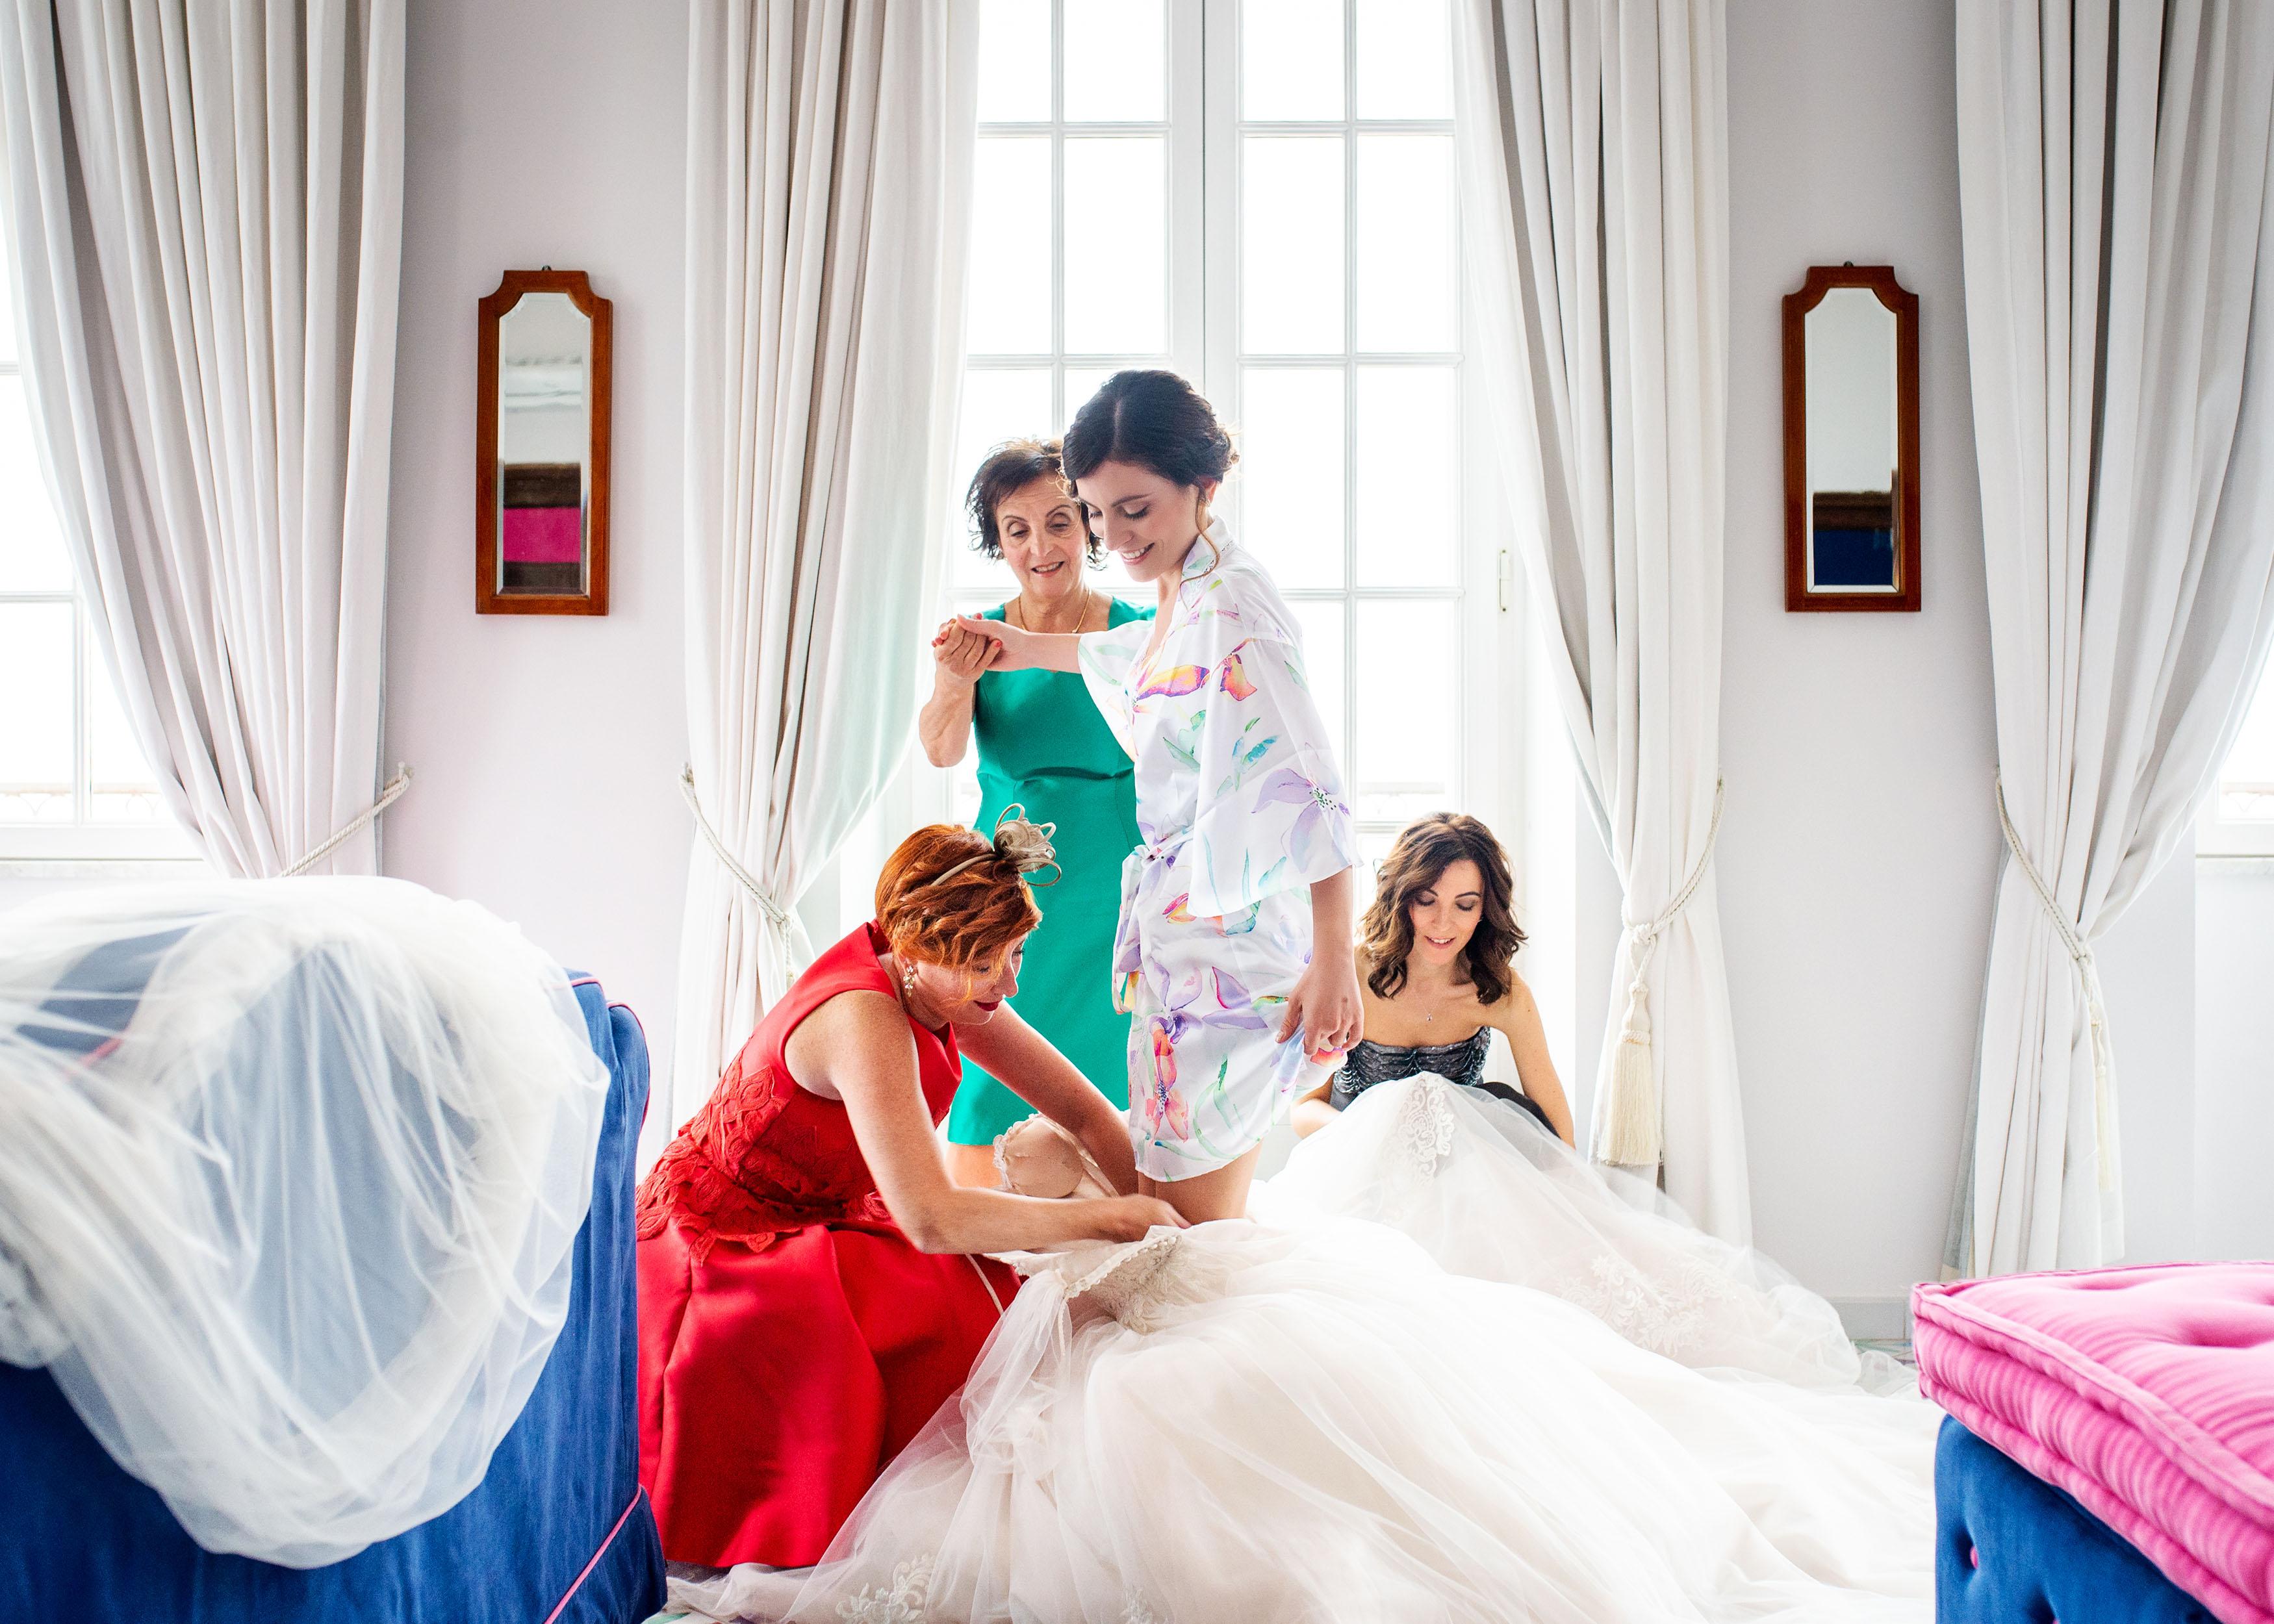 http://www.weddingamalfi.com/wp-content/uploads/Katia-Jorge-18-maggio-2019-14.jpg